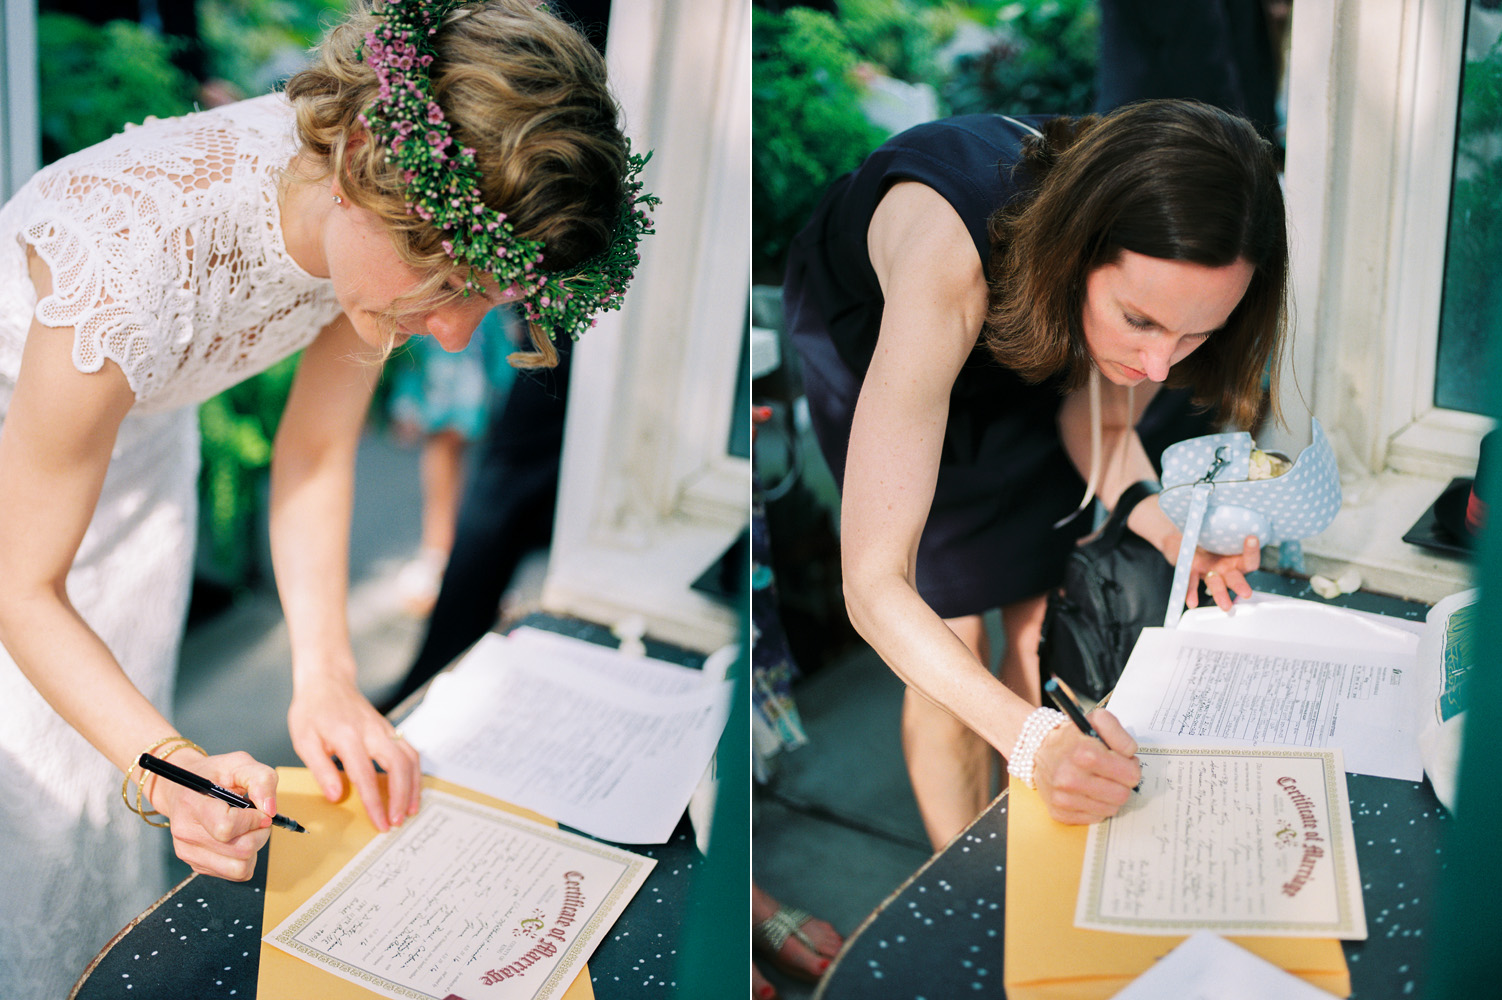 volunteer park conservatory wedding ceremony certificate.jpg